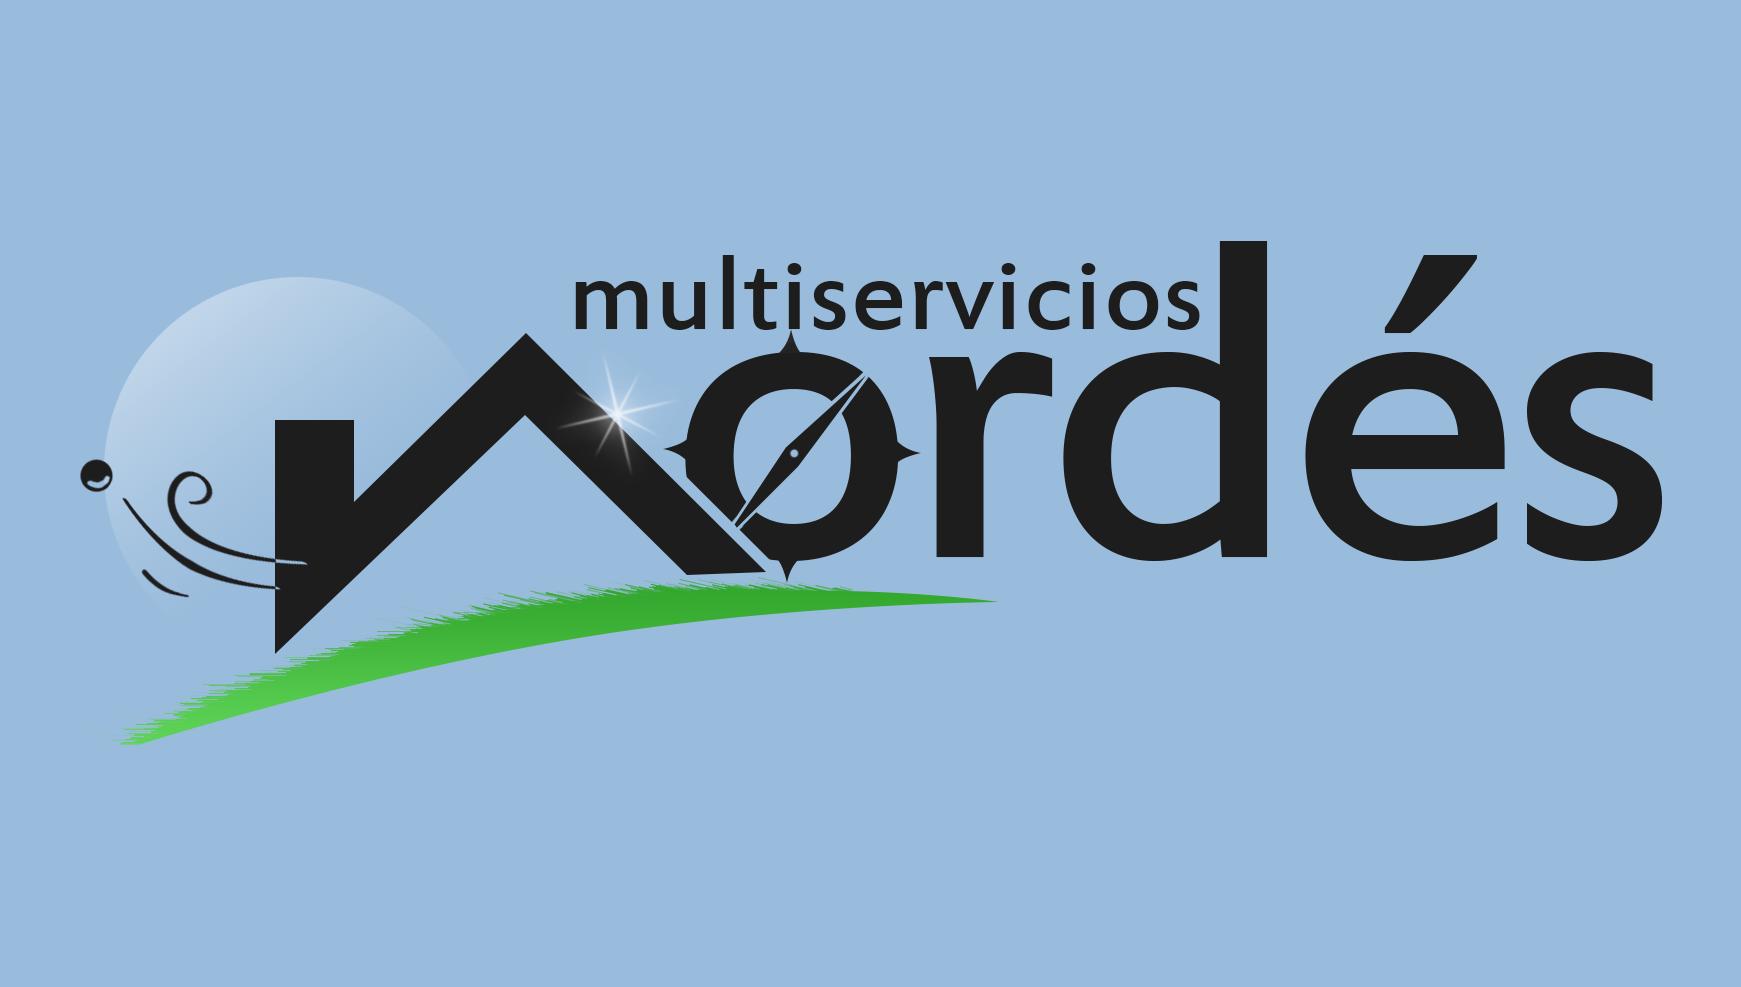 Multiservicios Nordés